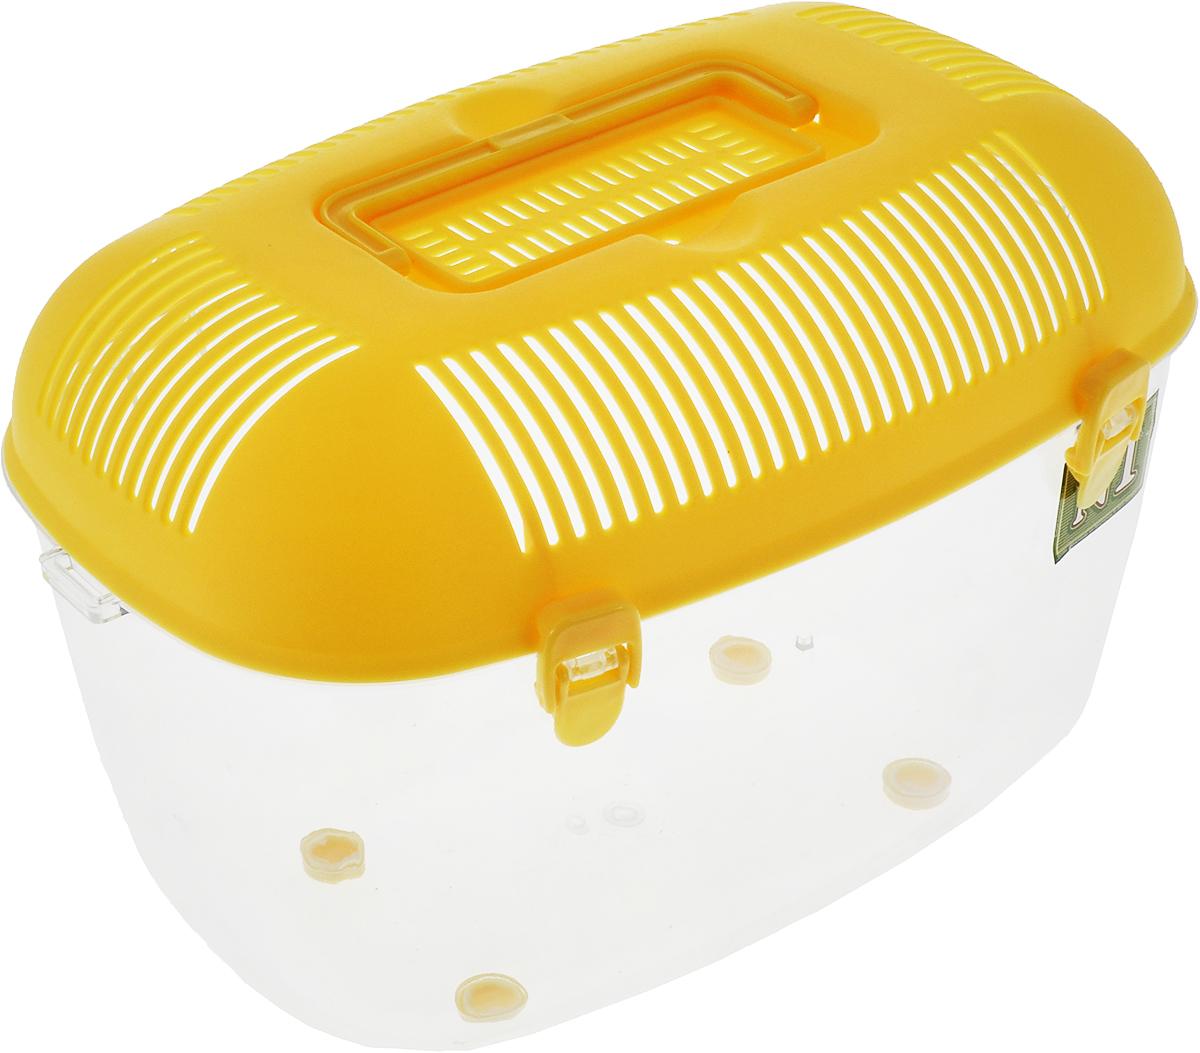 Фото - Переноска для грызунов №1, цвет: желтый, 35 х 22 х 24 см переноска для животных lion manufactory lm6406 2 серый желтый 40 х 27 х 26 см